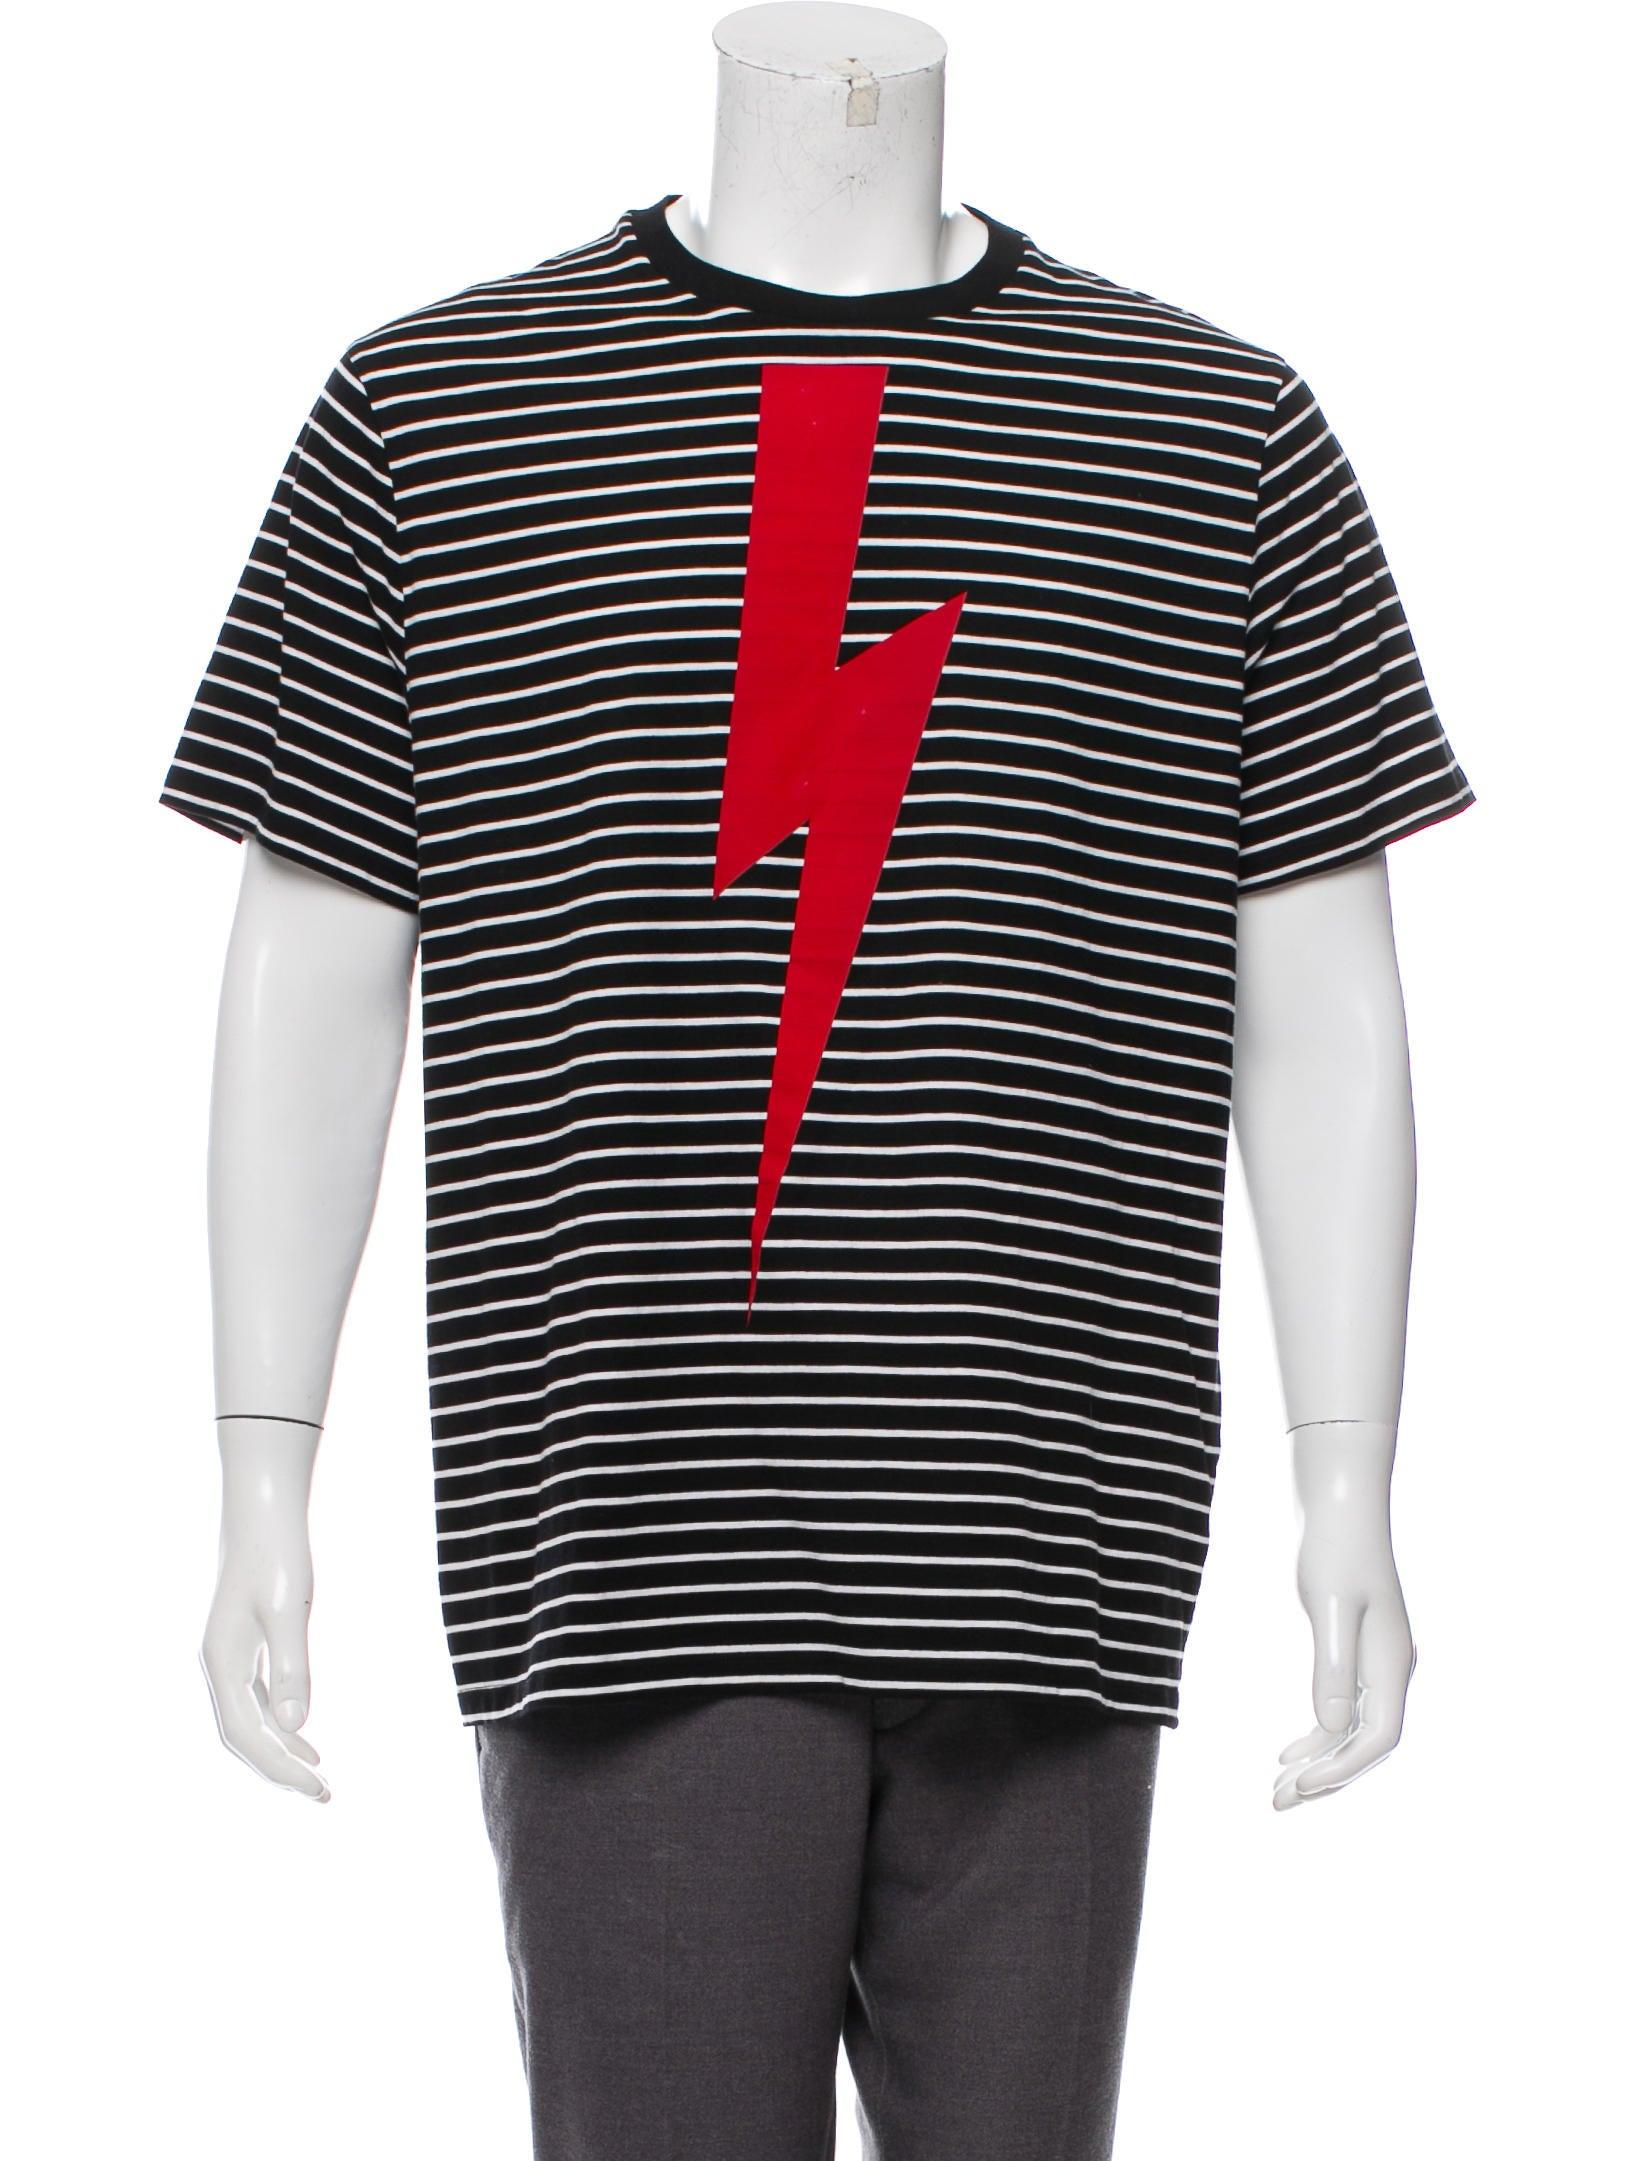 688e2147 Neil Barrett Striped Lightning Bolt T-Shirt - Clothing - NEB22539 ...